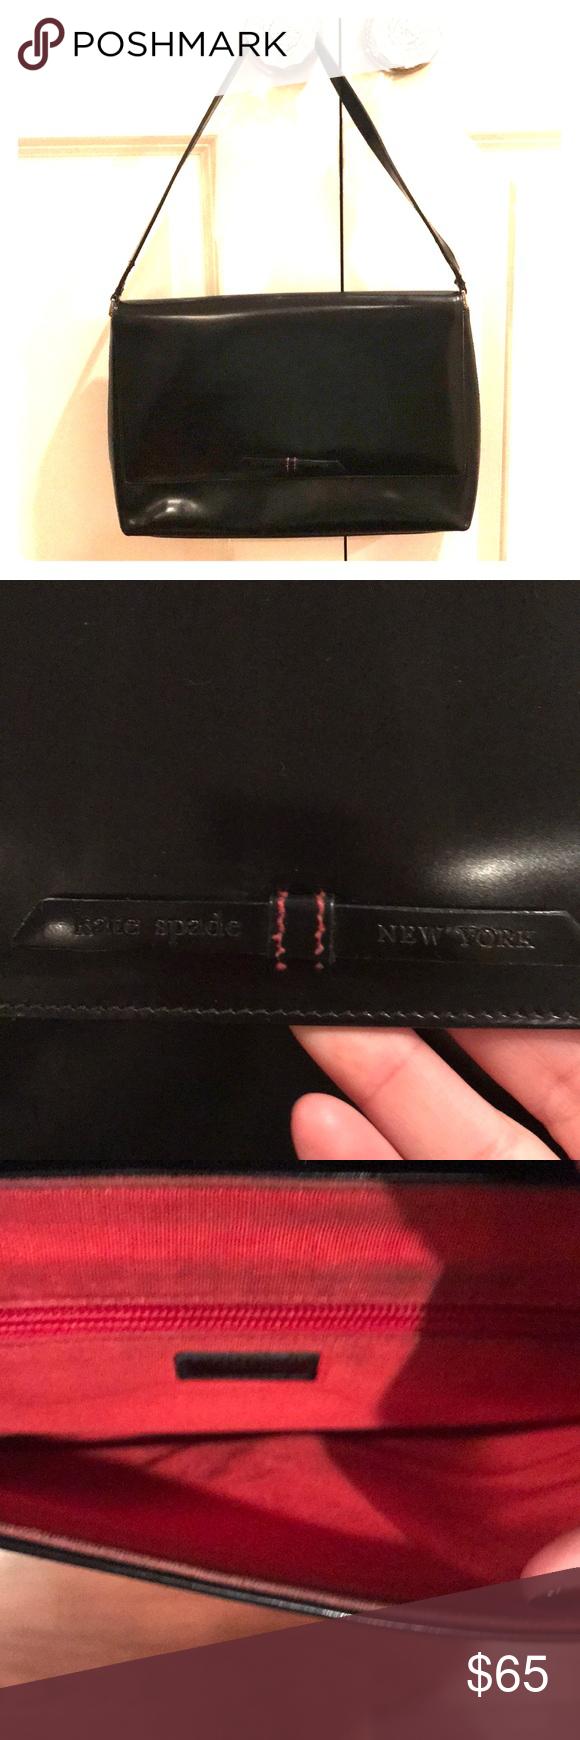 665bcb0491 Kate Spade black handbag A true classic ! Kate Spade black patent leather  shoulder bag in